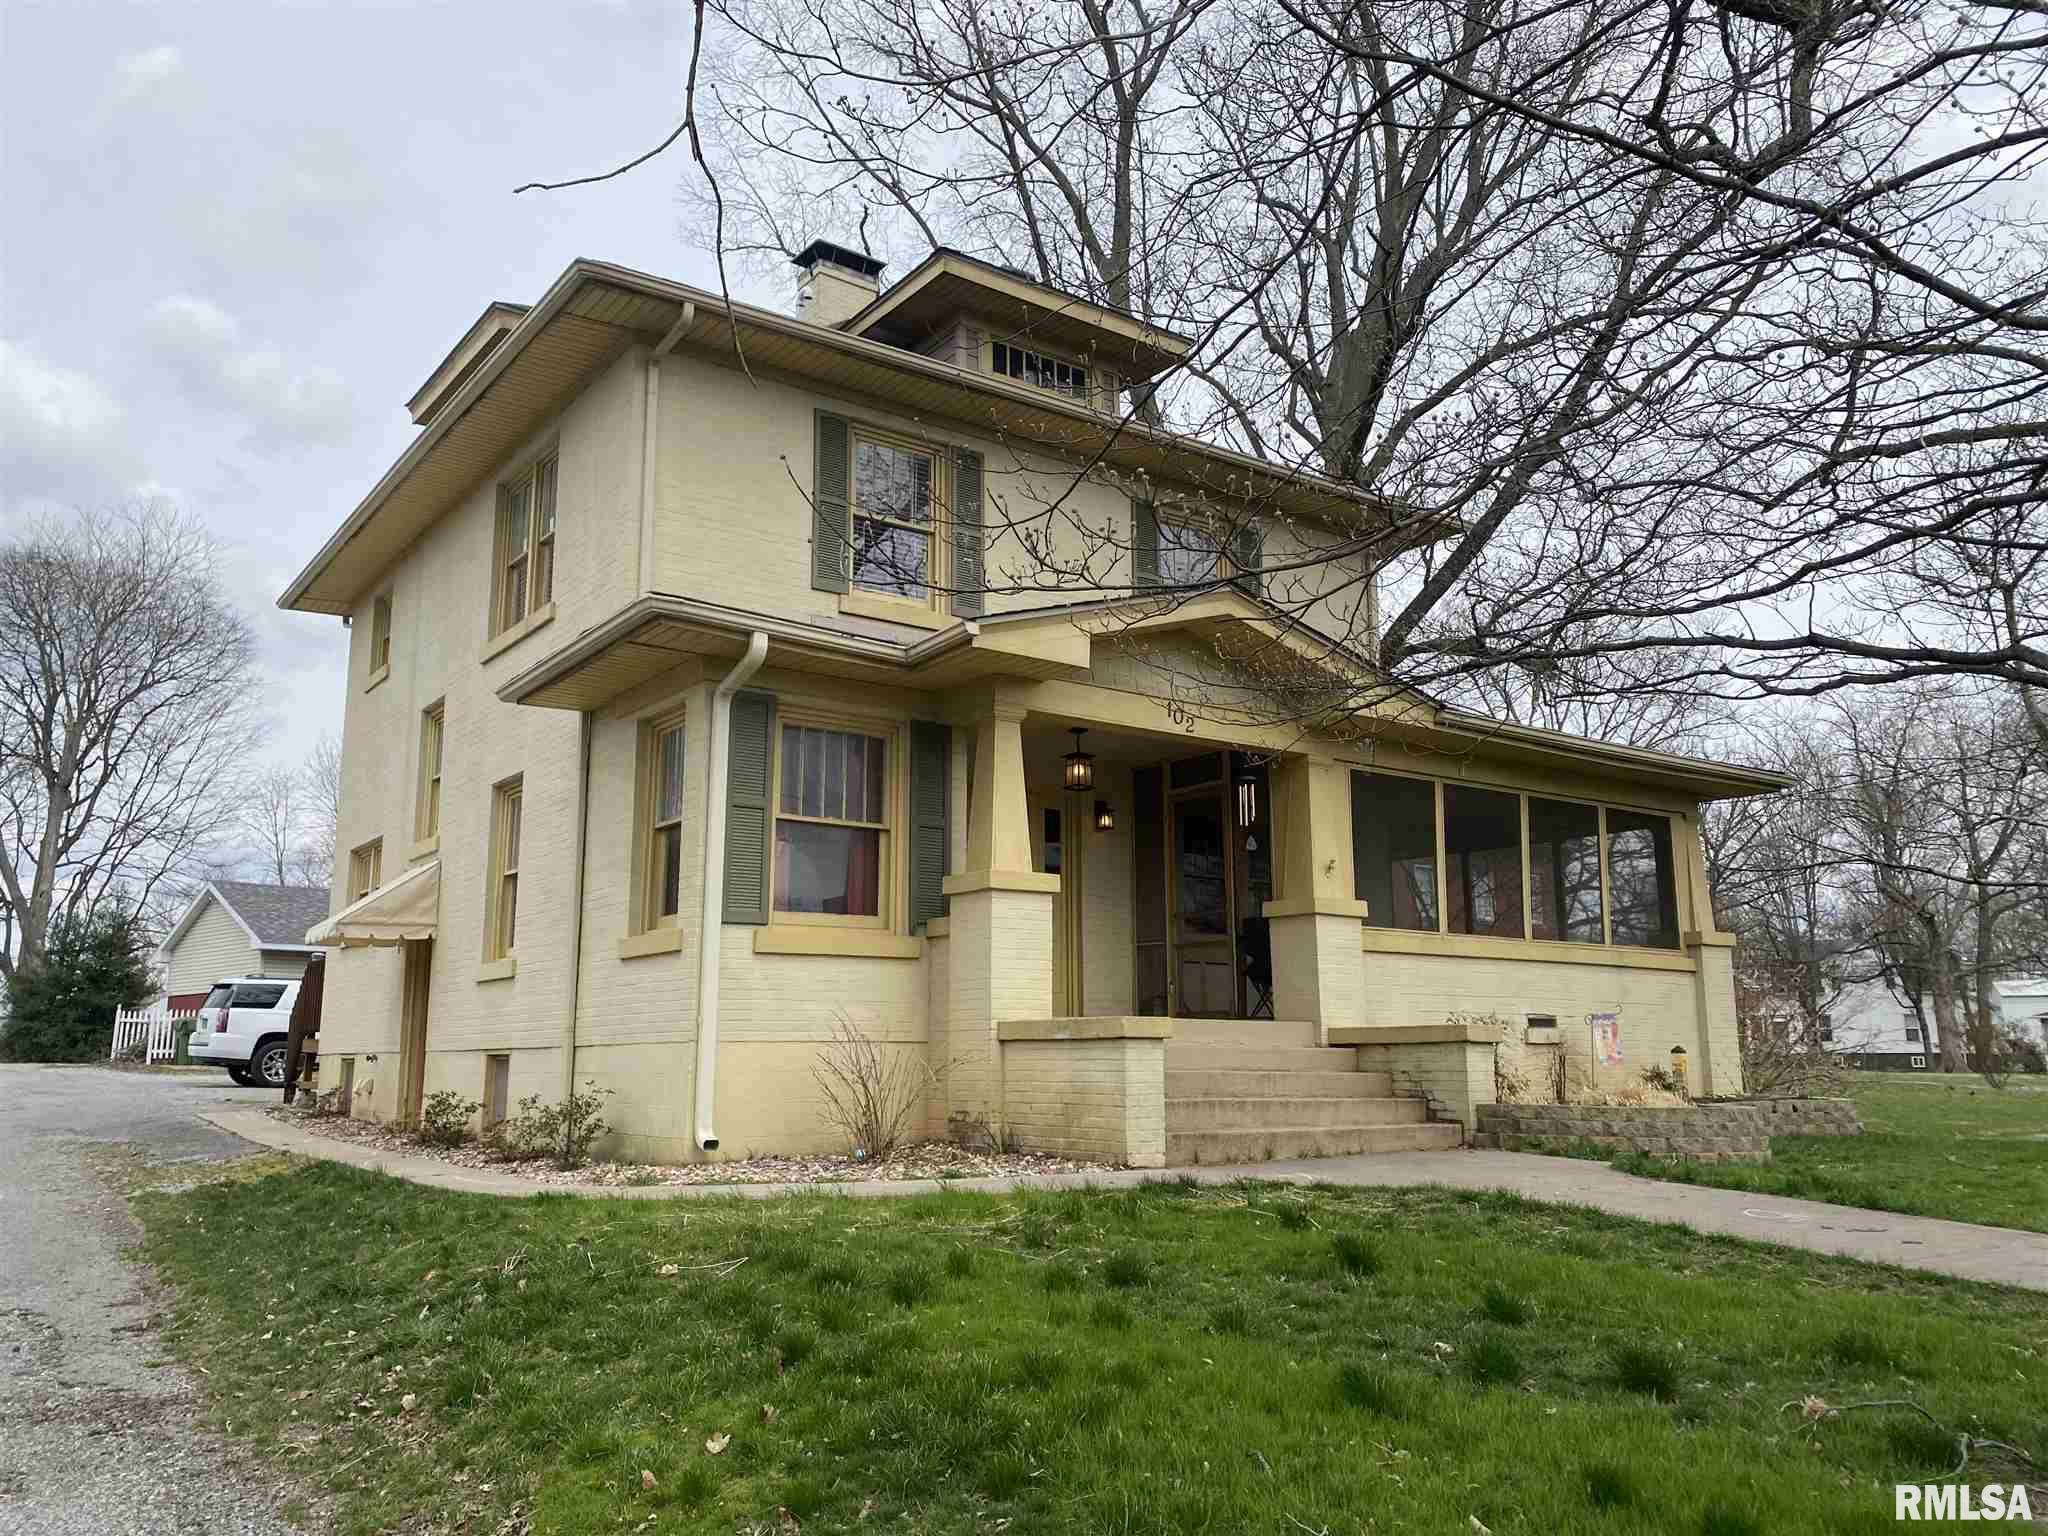 102 W MONROE Property Photo - Anna, IL real estate listing